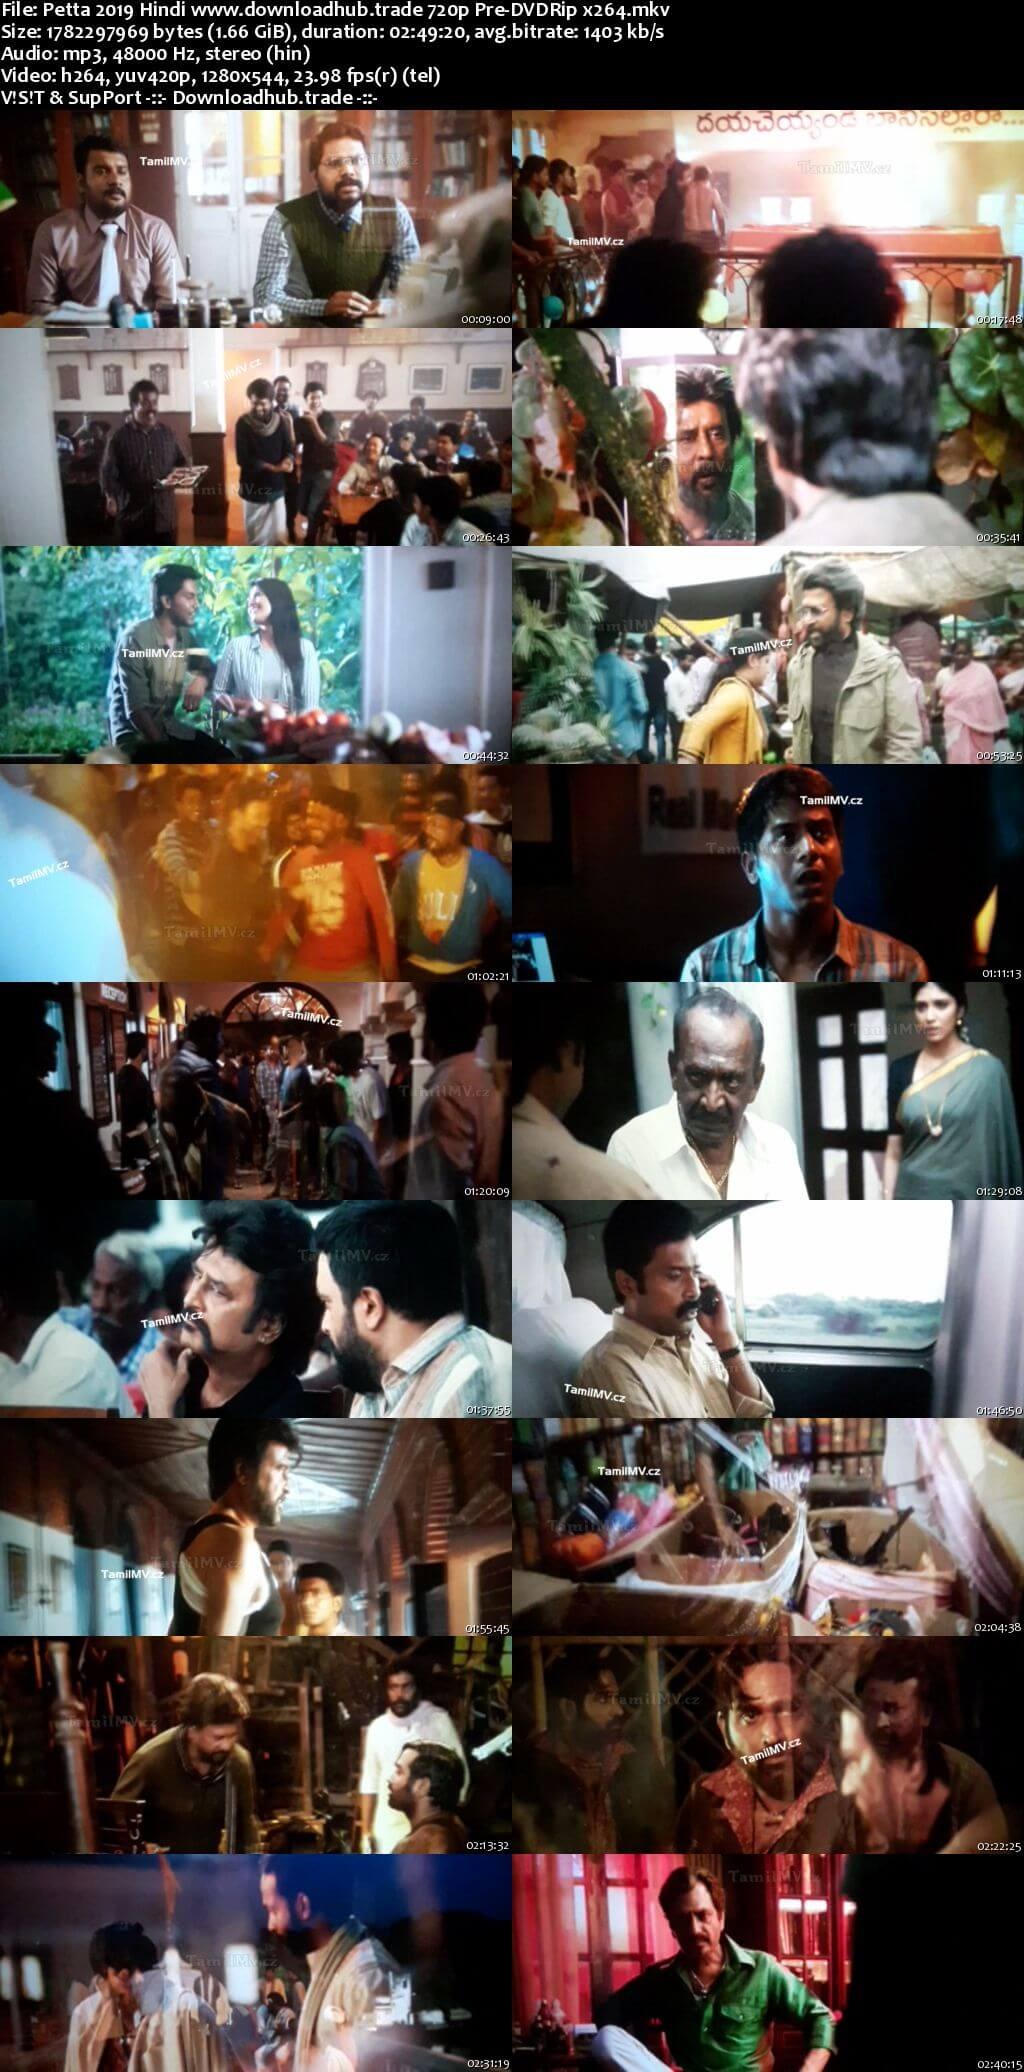 Petta 2019 Hindi 720p Pre-DVDRip x264